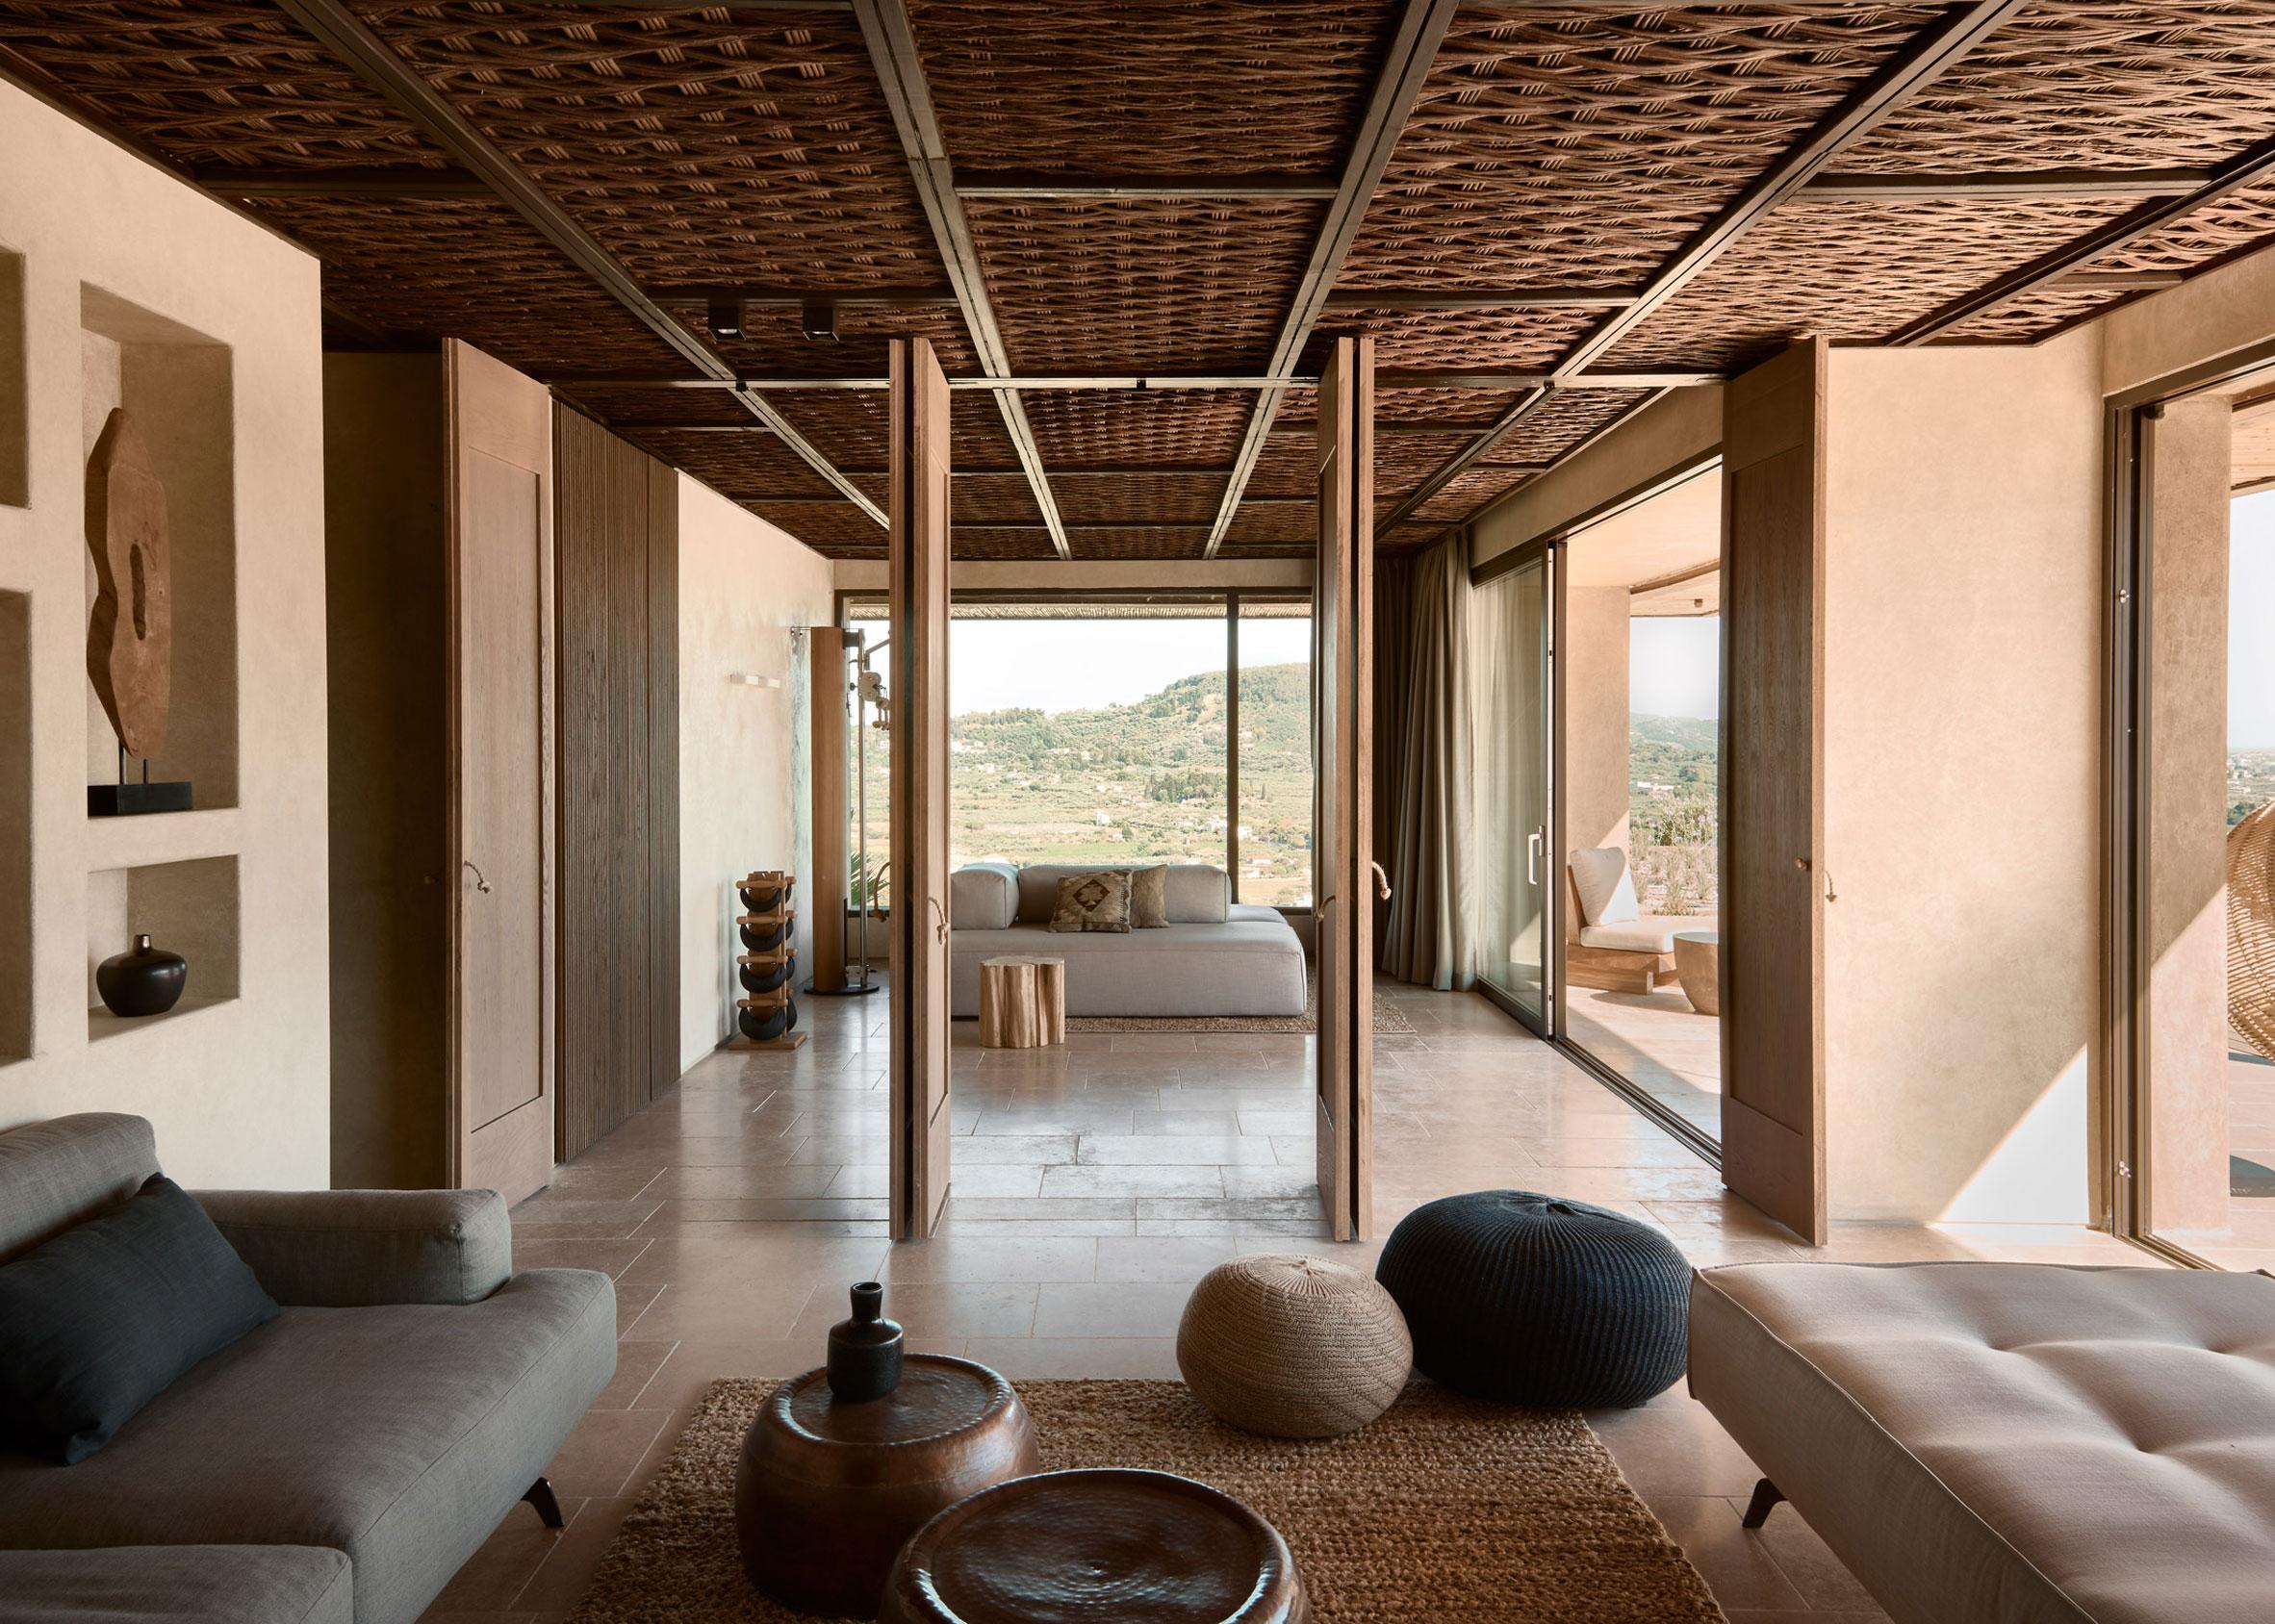 Olea Hotel, Greece, by Block722 Architects